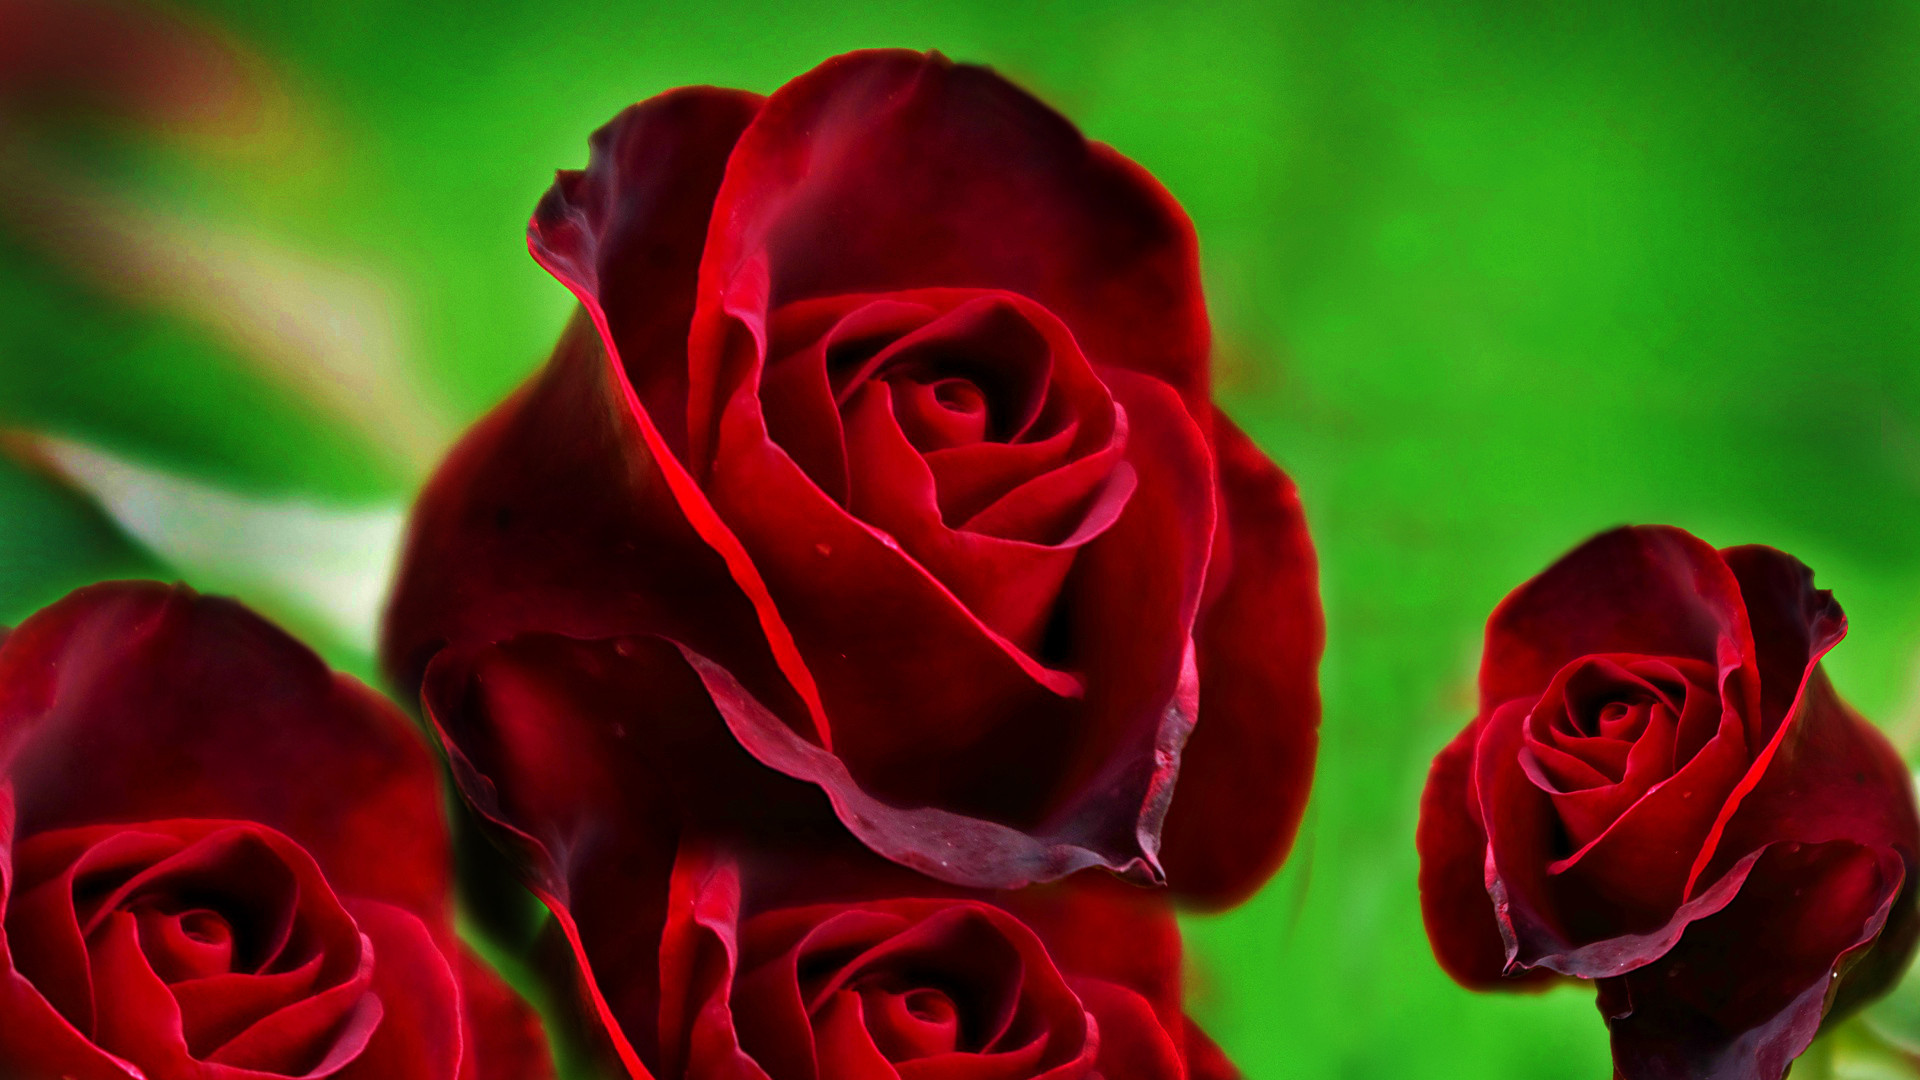 … wallpaper-of-red-roses-hd-free-wallpaper …